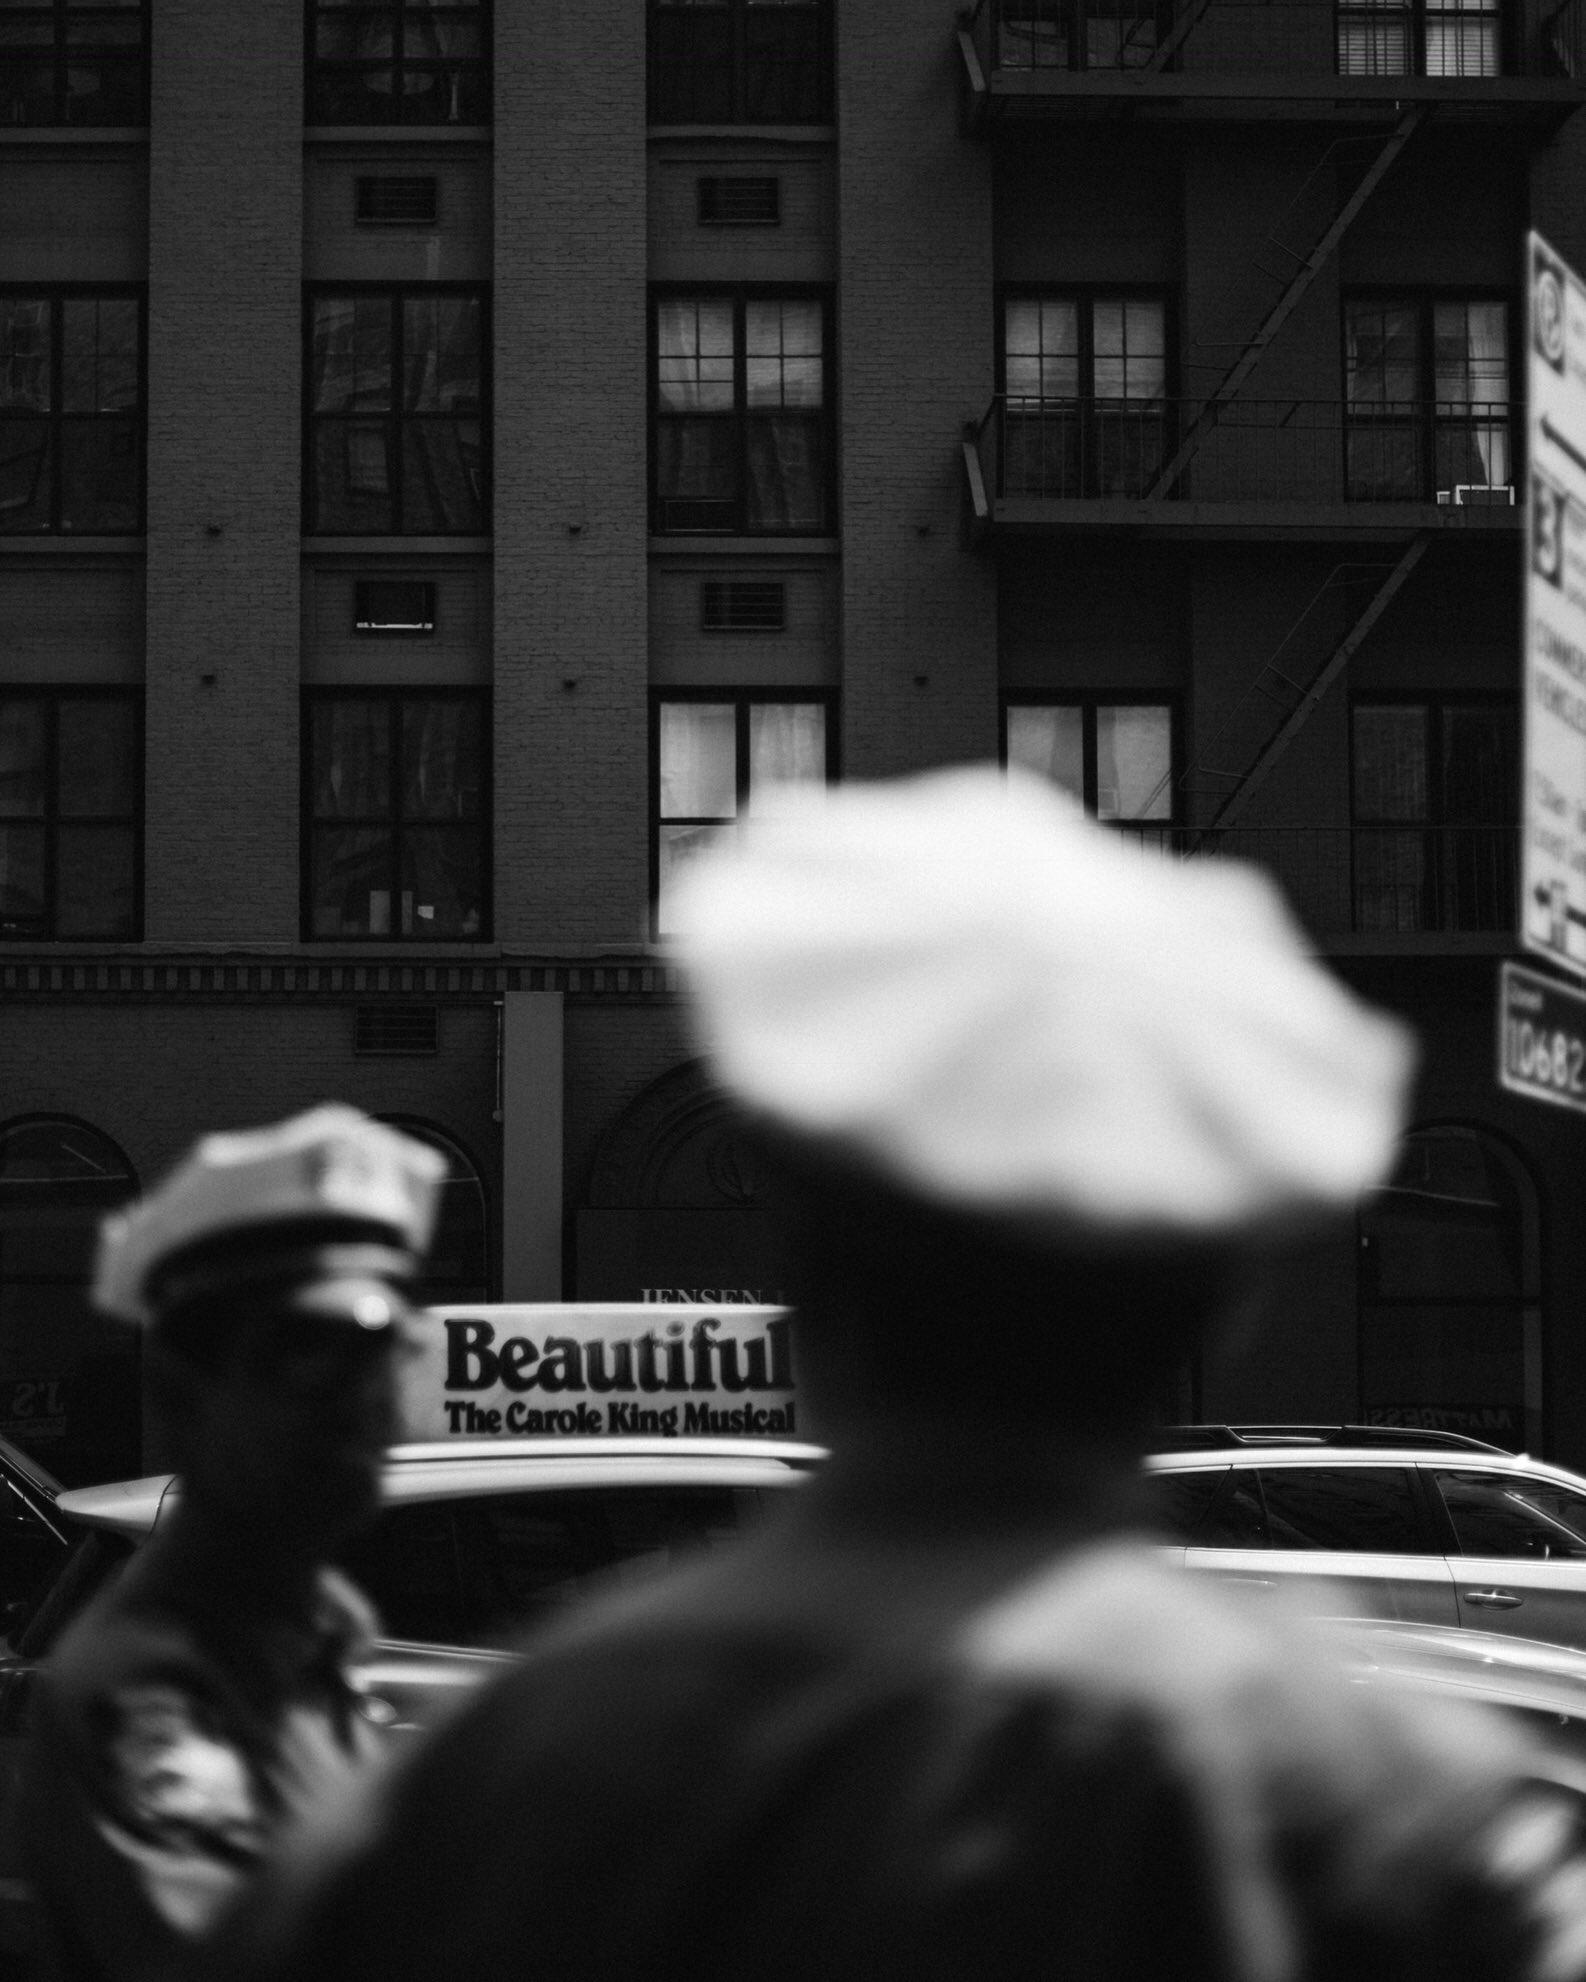 candid_street_photography_13.jpg